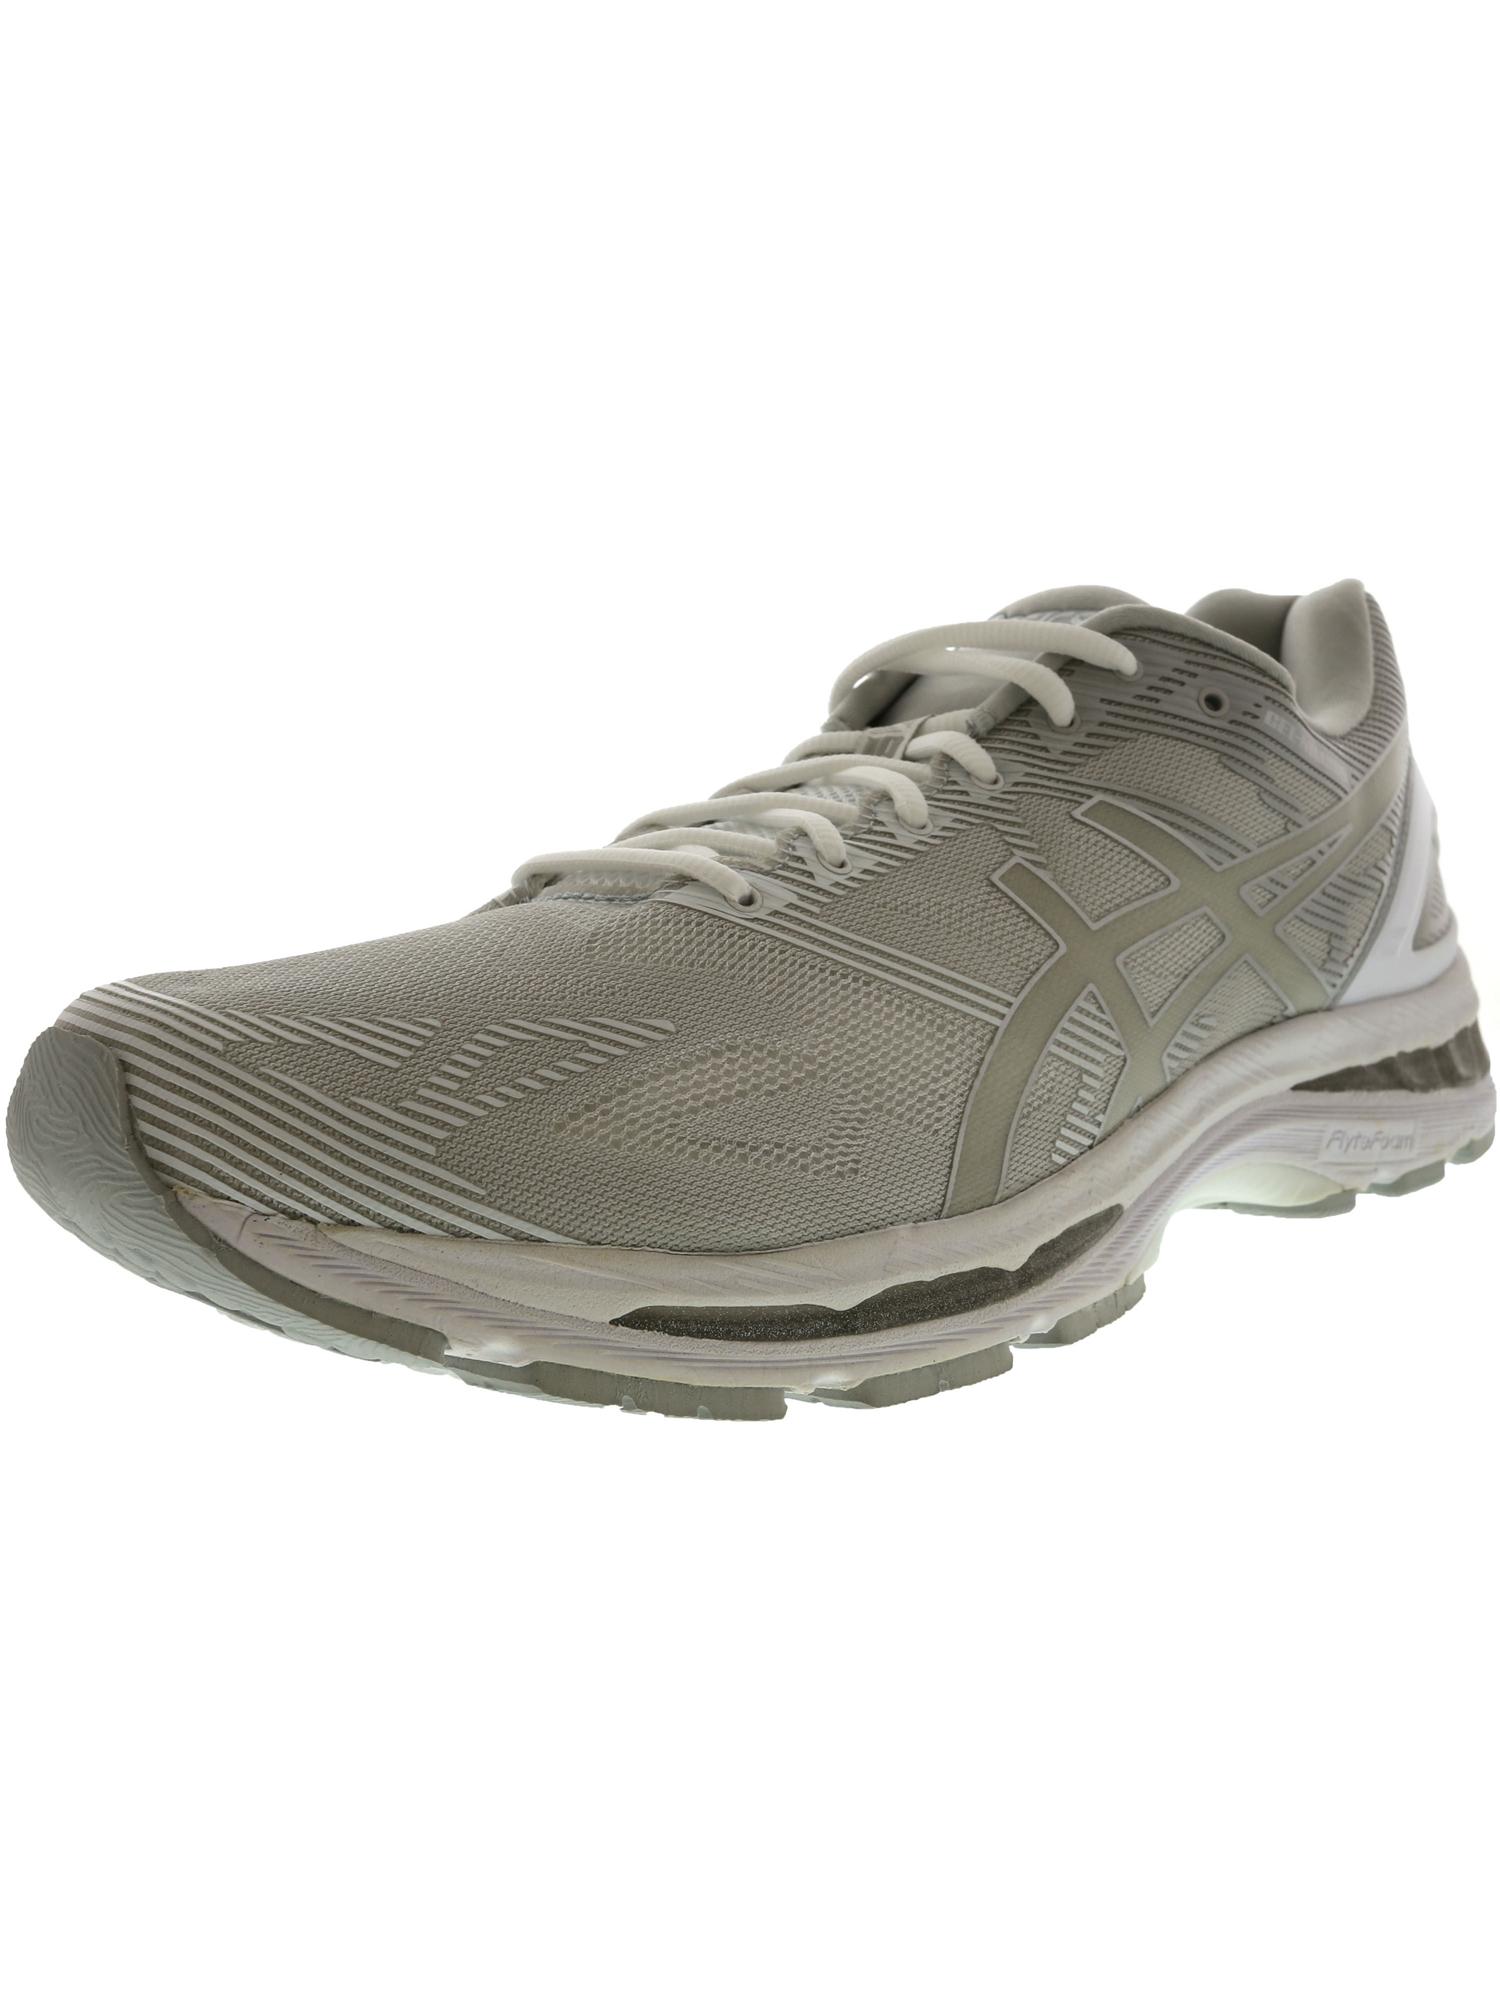 Asics Men's Gel-Nimbus 19 Carbon / White Silver Ankle-High Running Shoe - 9.5W